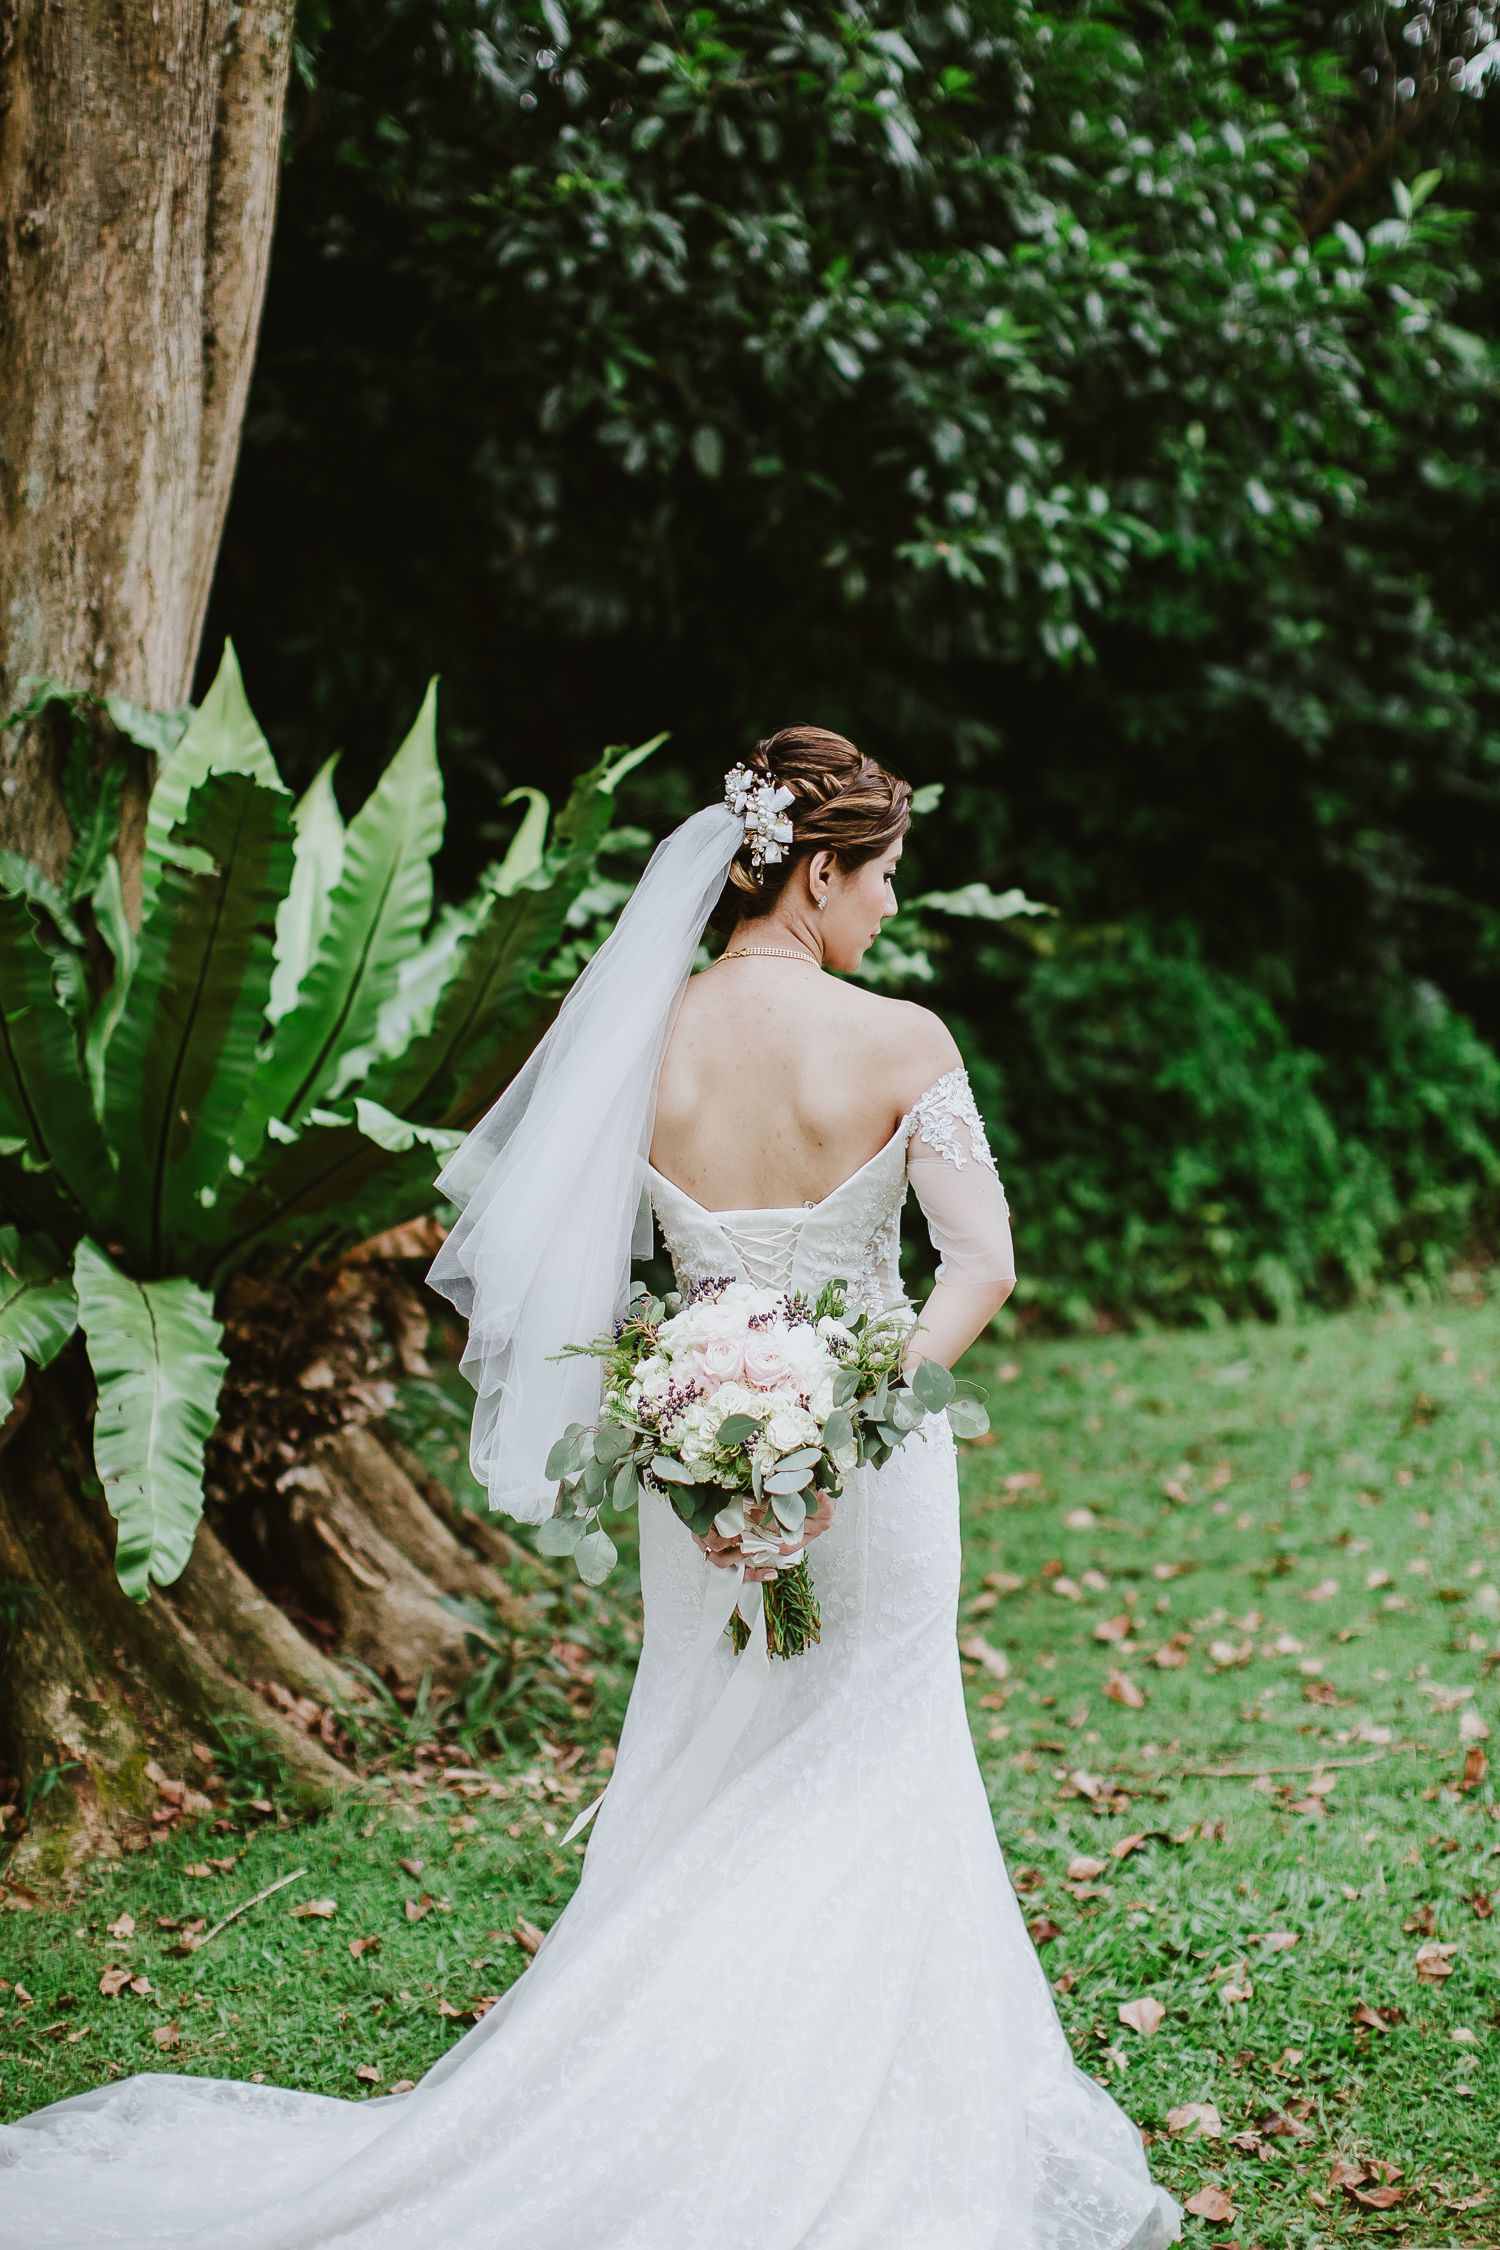 Singapore+Actual+Day+Wedding+Photographer+Raffles+Town+Club+Jeremiah+Christina-0074.jpg